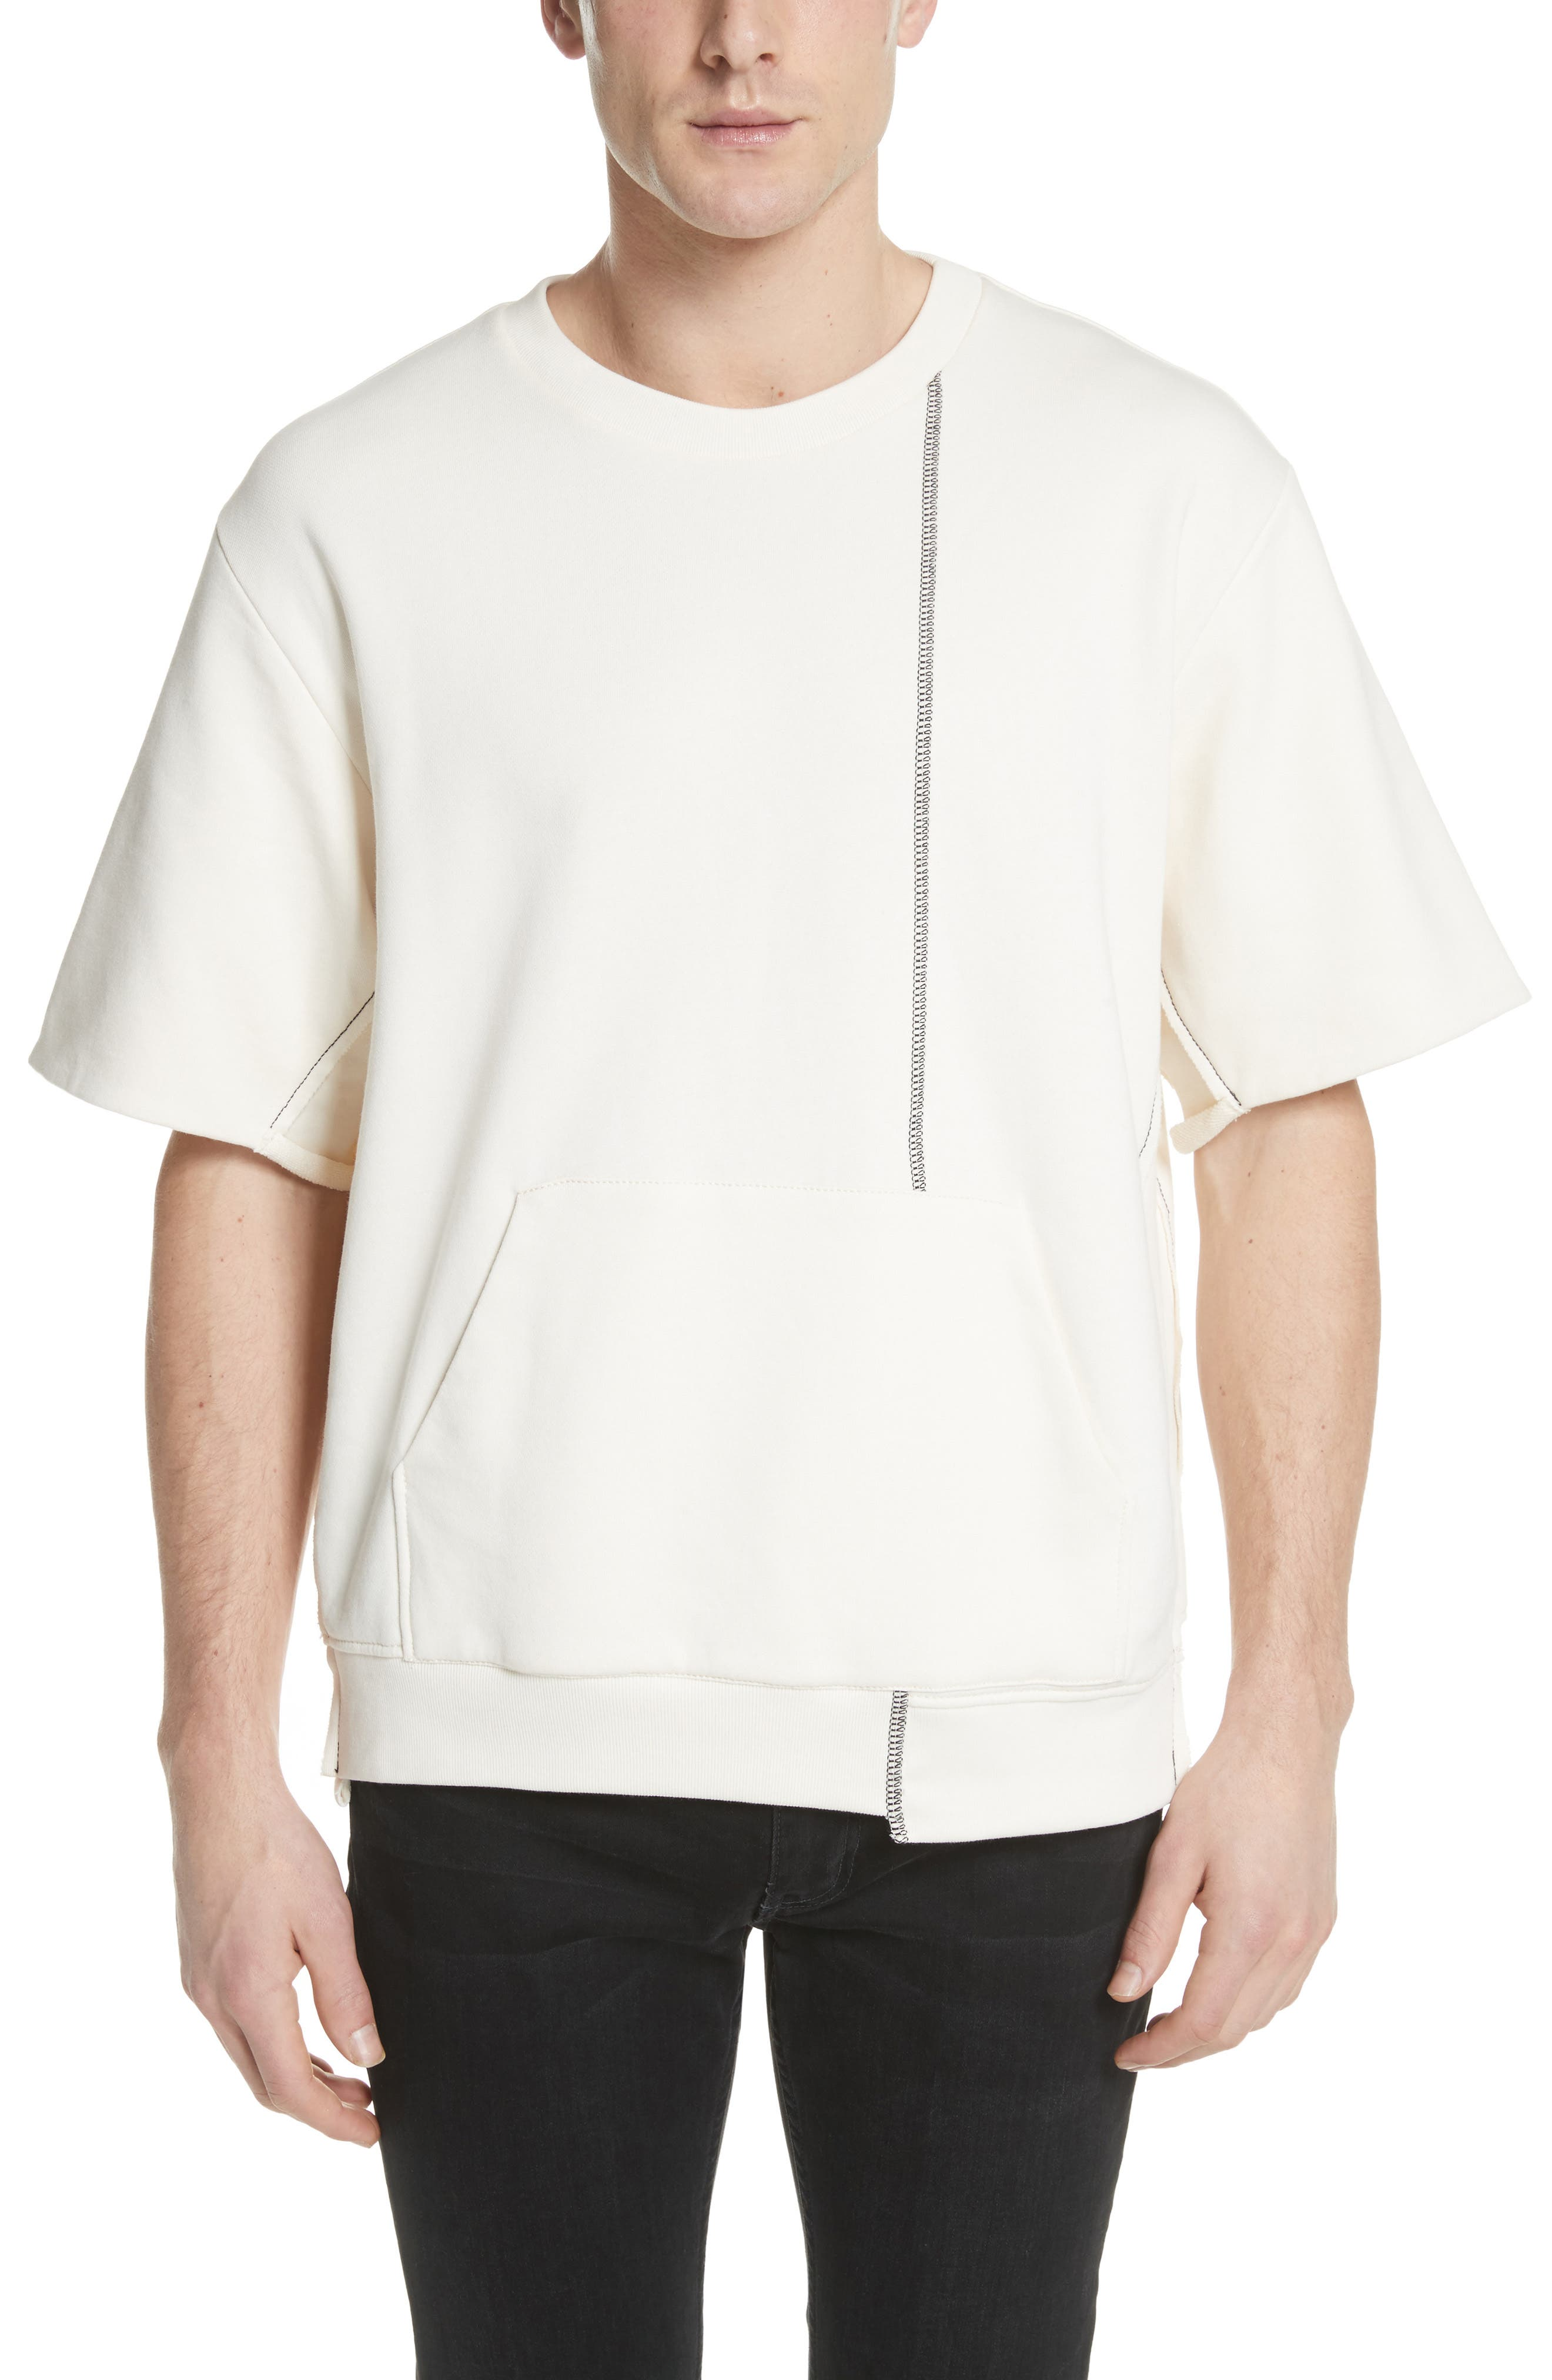 Main Image - 3.1 Phillip Lim Reconstructed Short Sleeve Sweatshirt